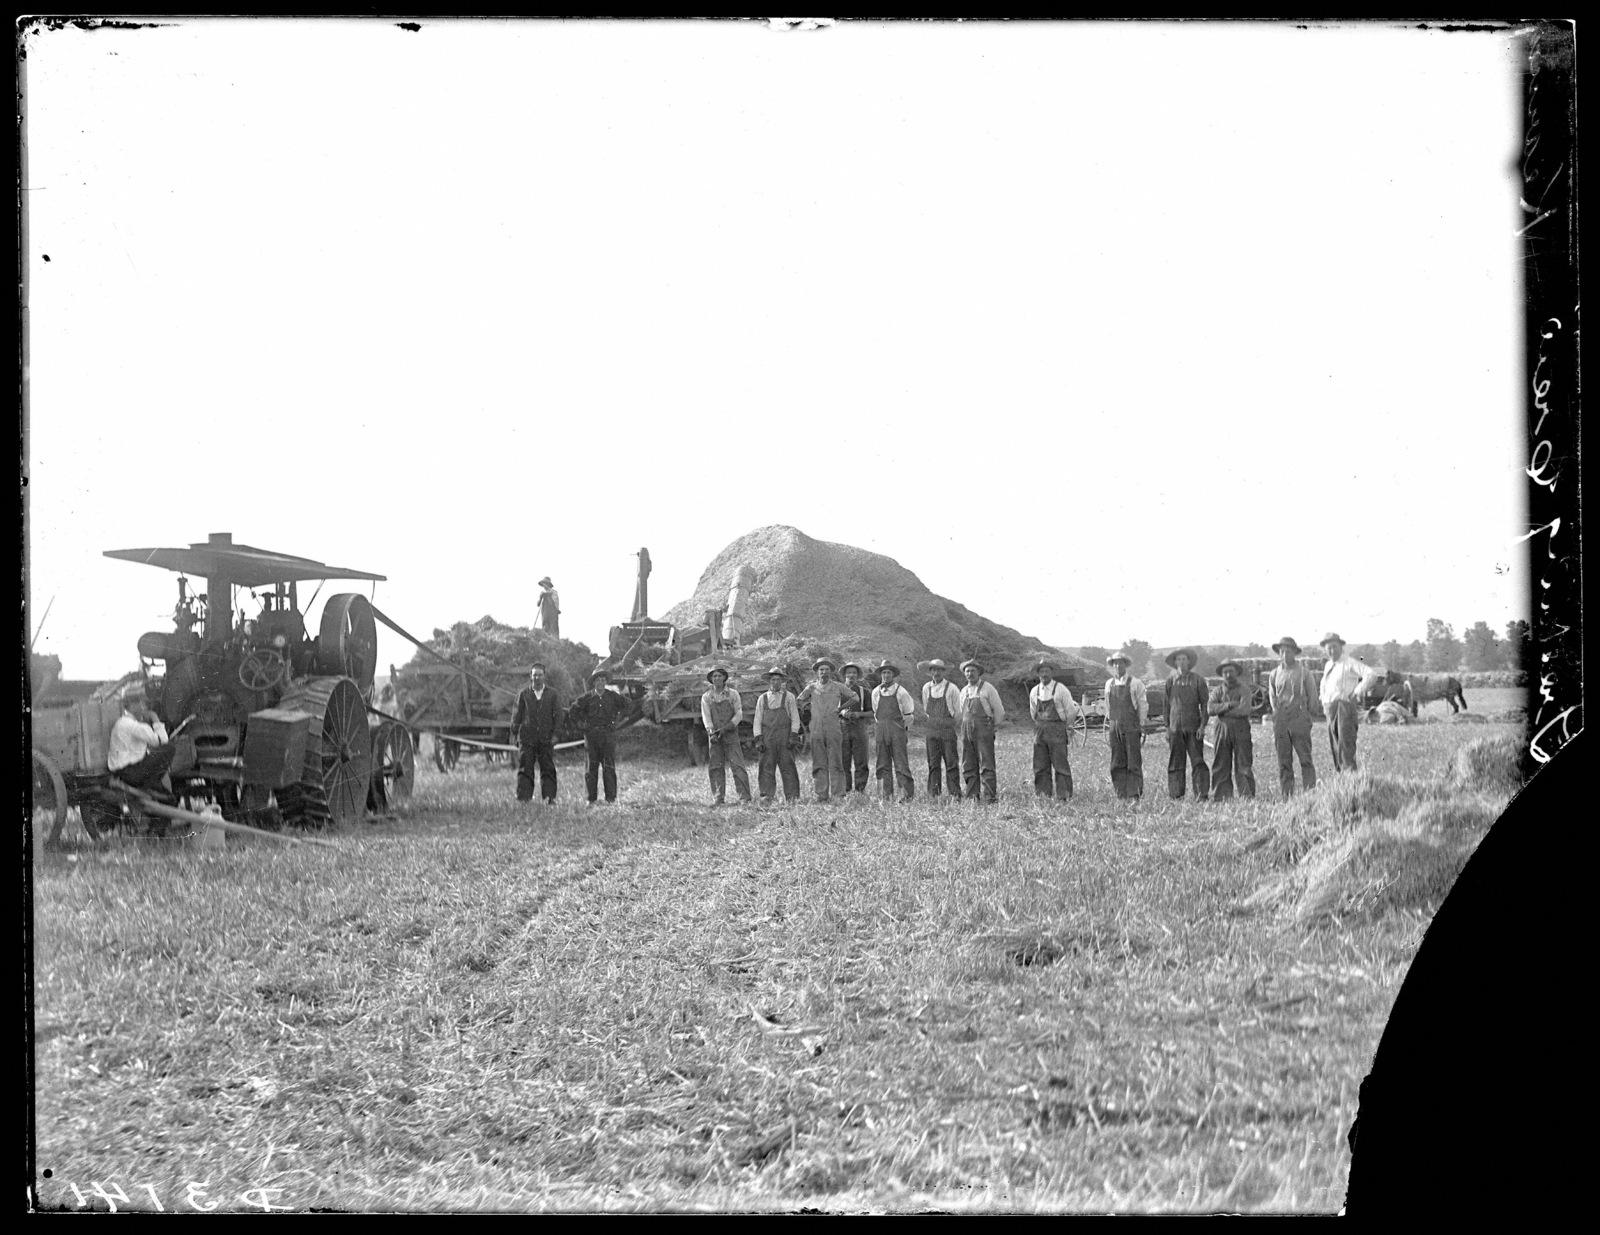 Hellrigles threshing crew west of Kearney, Nebraska.